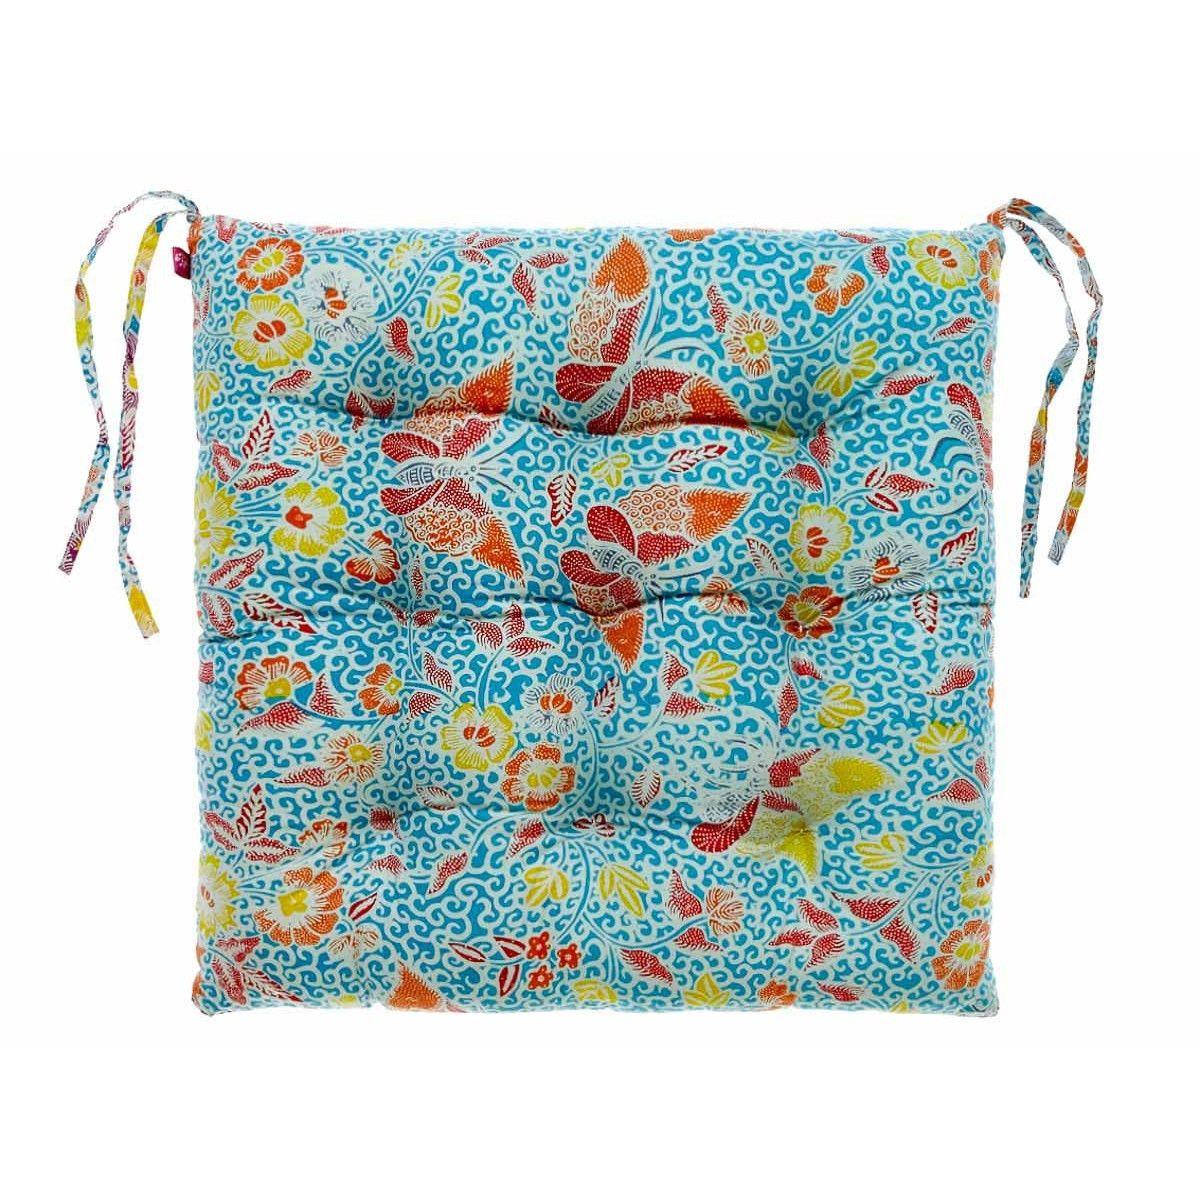 Galette de chaise Butterfly